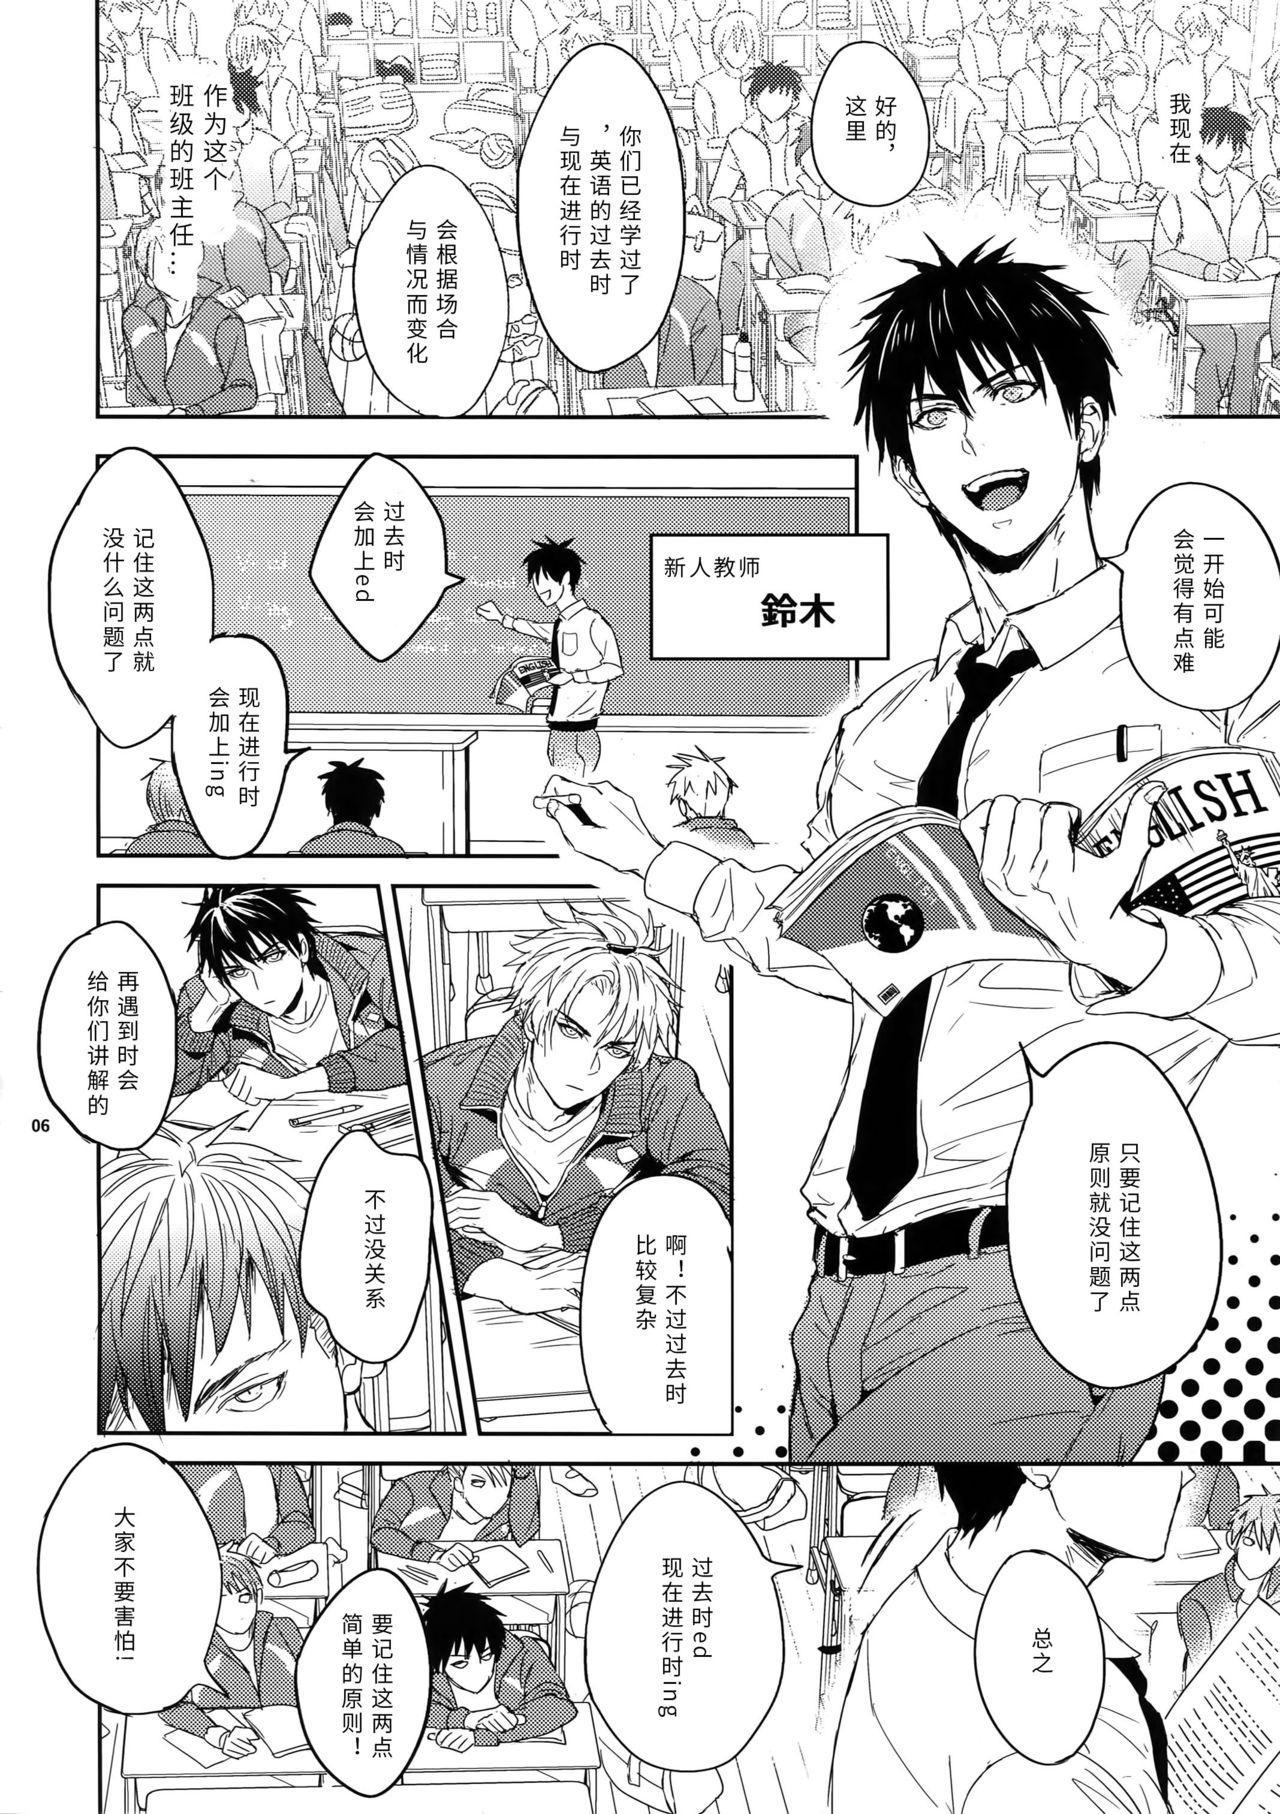 Sensei wa Nekketsu ga Areba Juubunda! | 老师只要热血就够了! 4